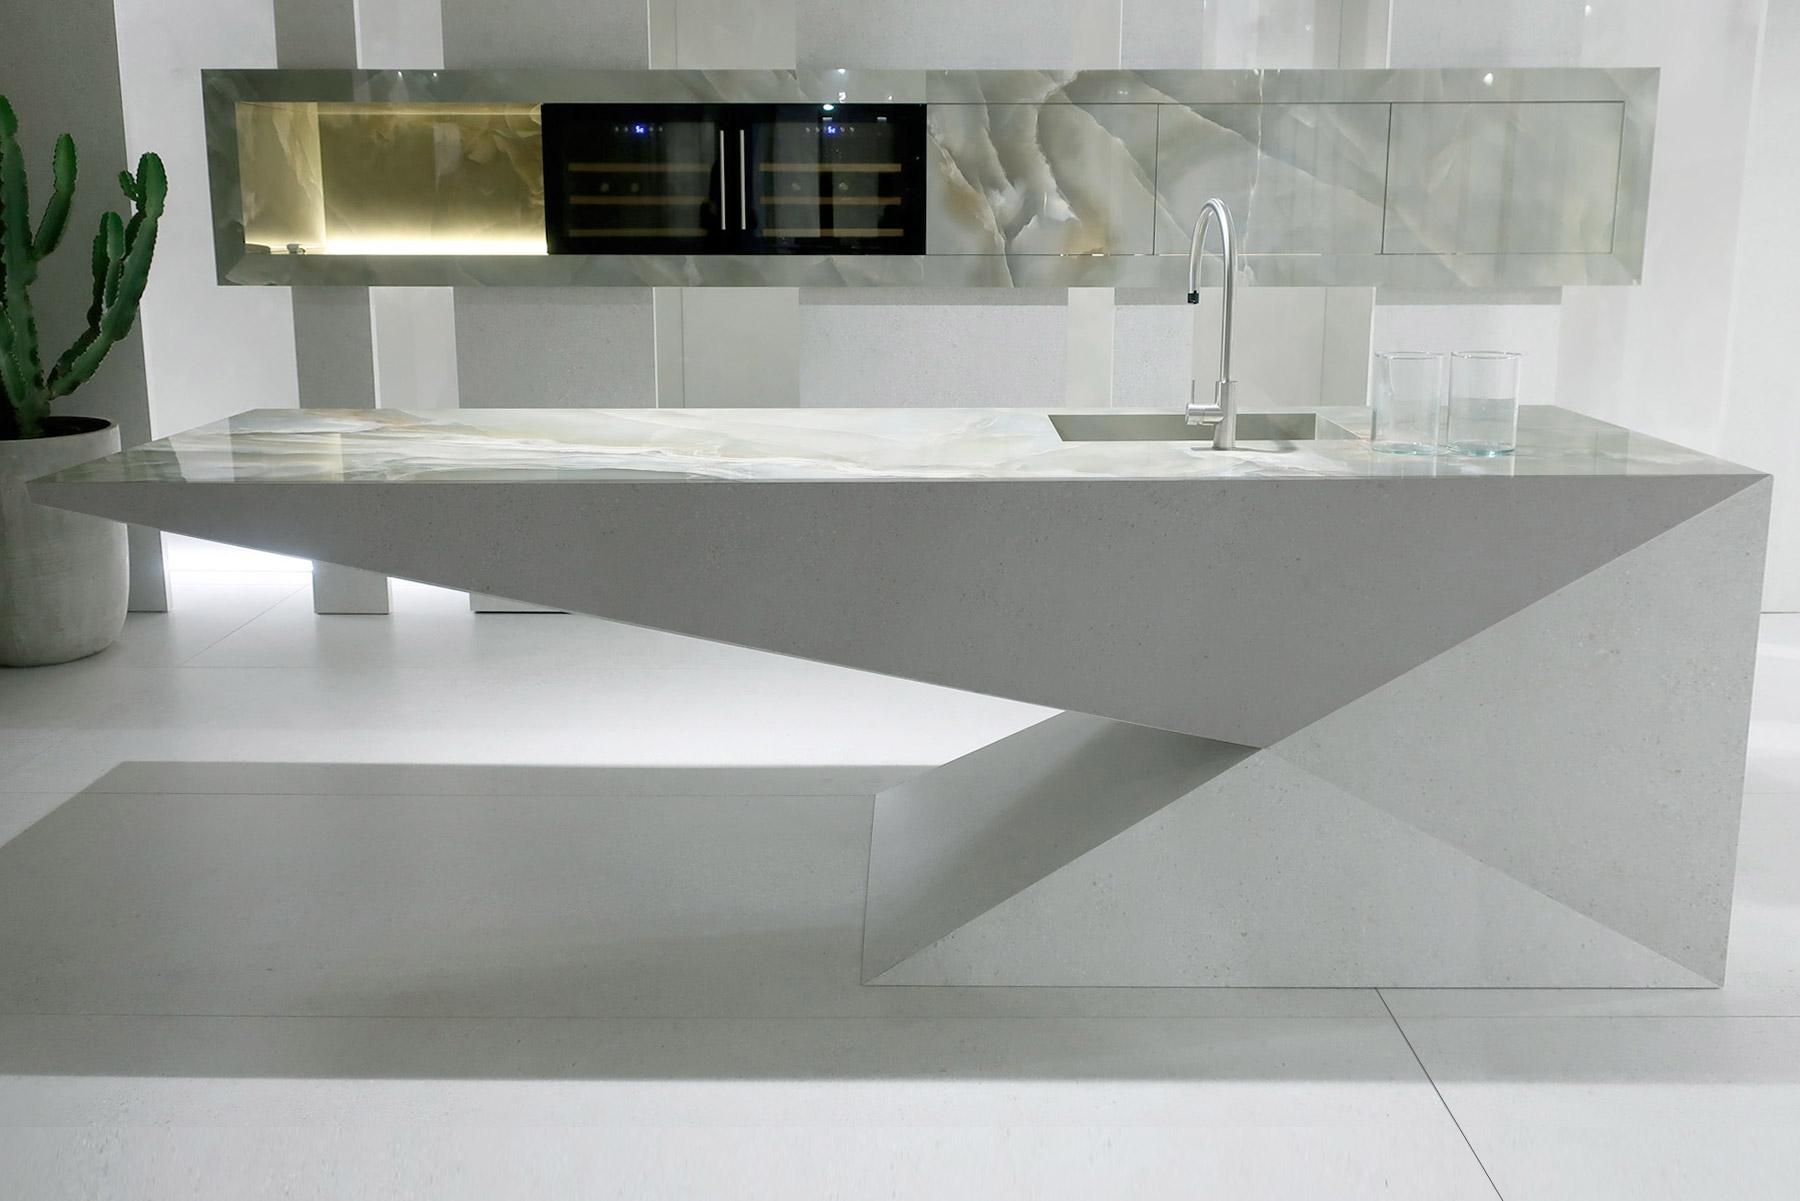 Porcelain tiles | Finest Italian porcelain wall and floor tiles